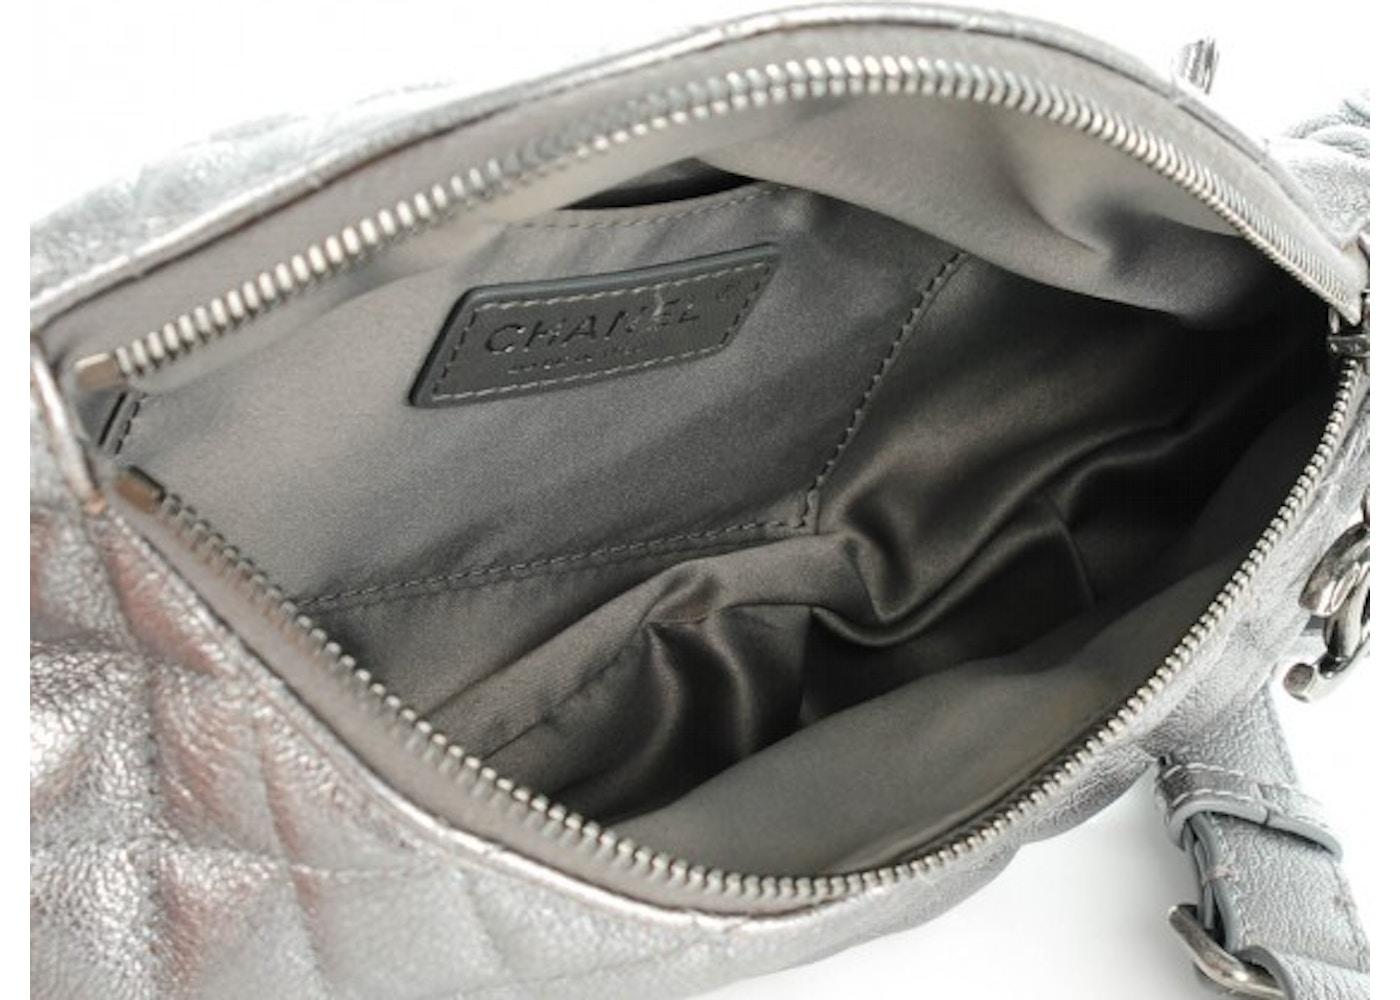 0a6ee1d6372d Chanel Banane Waist Bag Quilted Metallic Silver